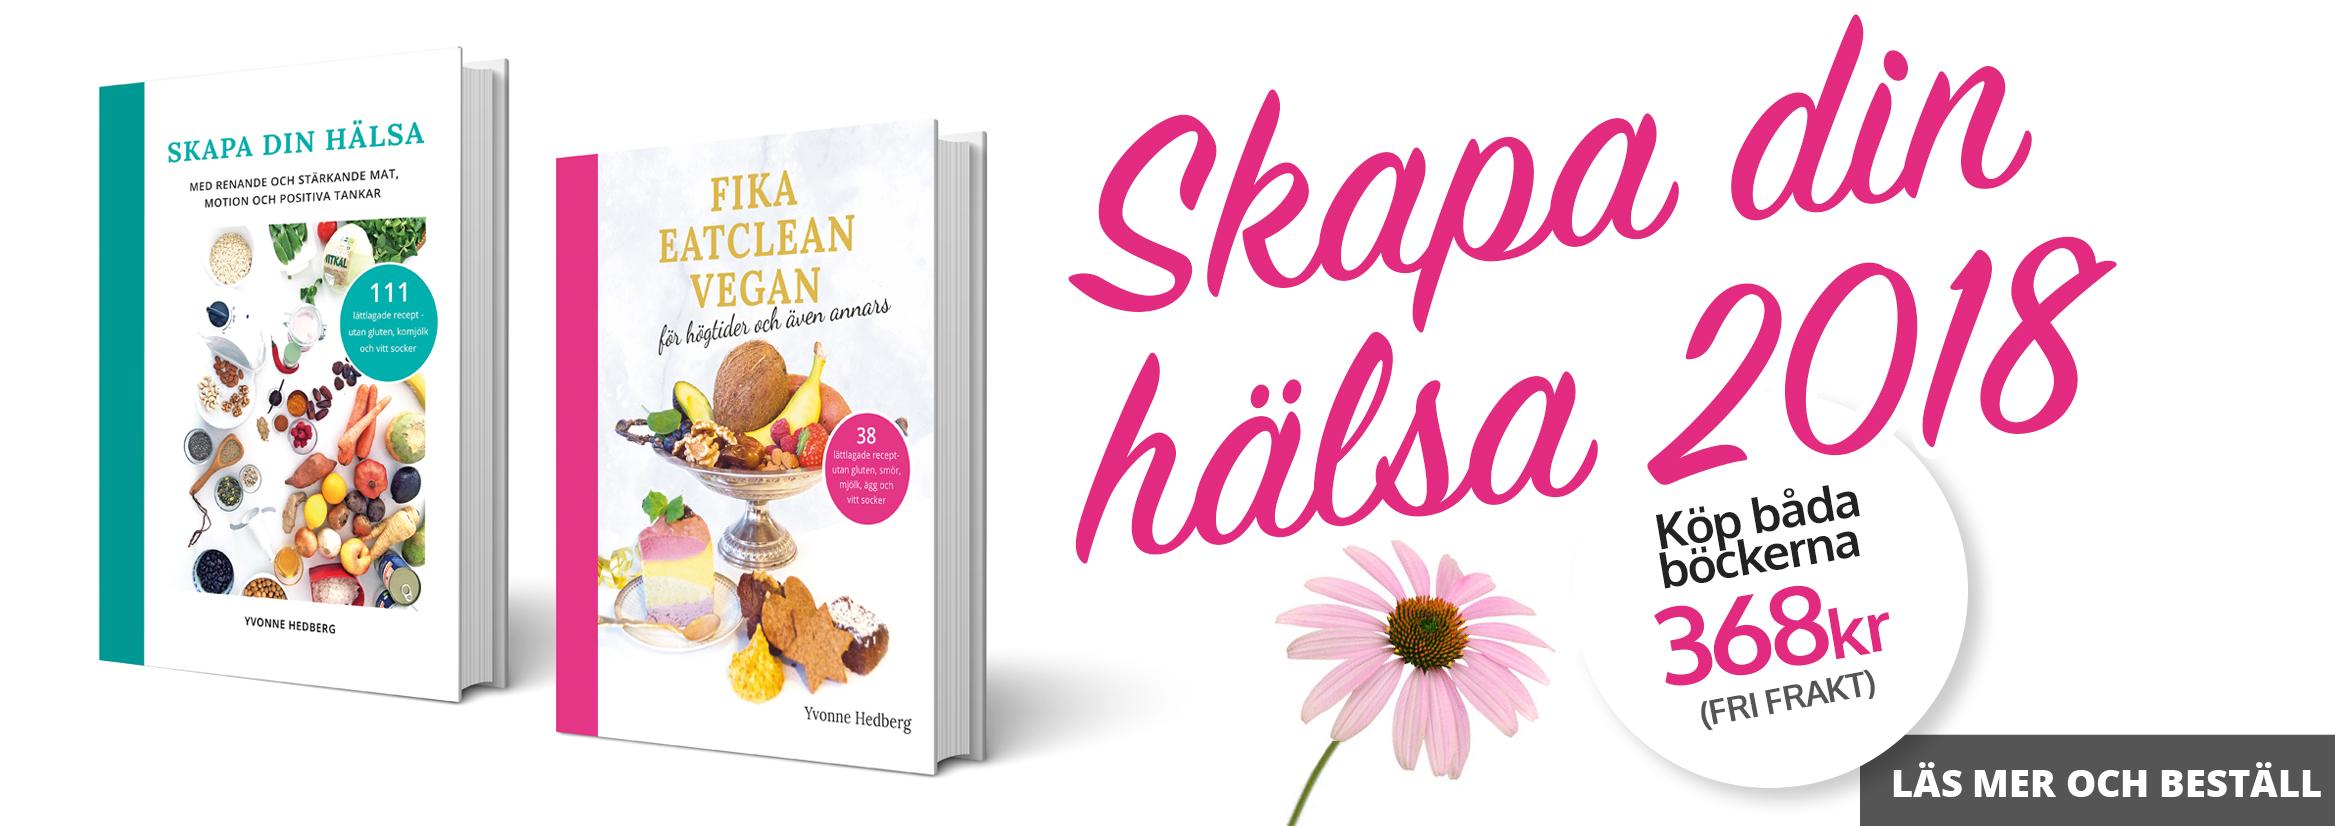 healthcreator har nu rea på kokboken skapa din hälsa och kakboken fika eatclean vegan av Yvonne Hedberg